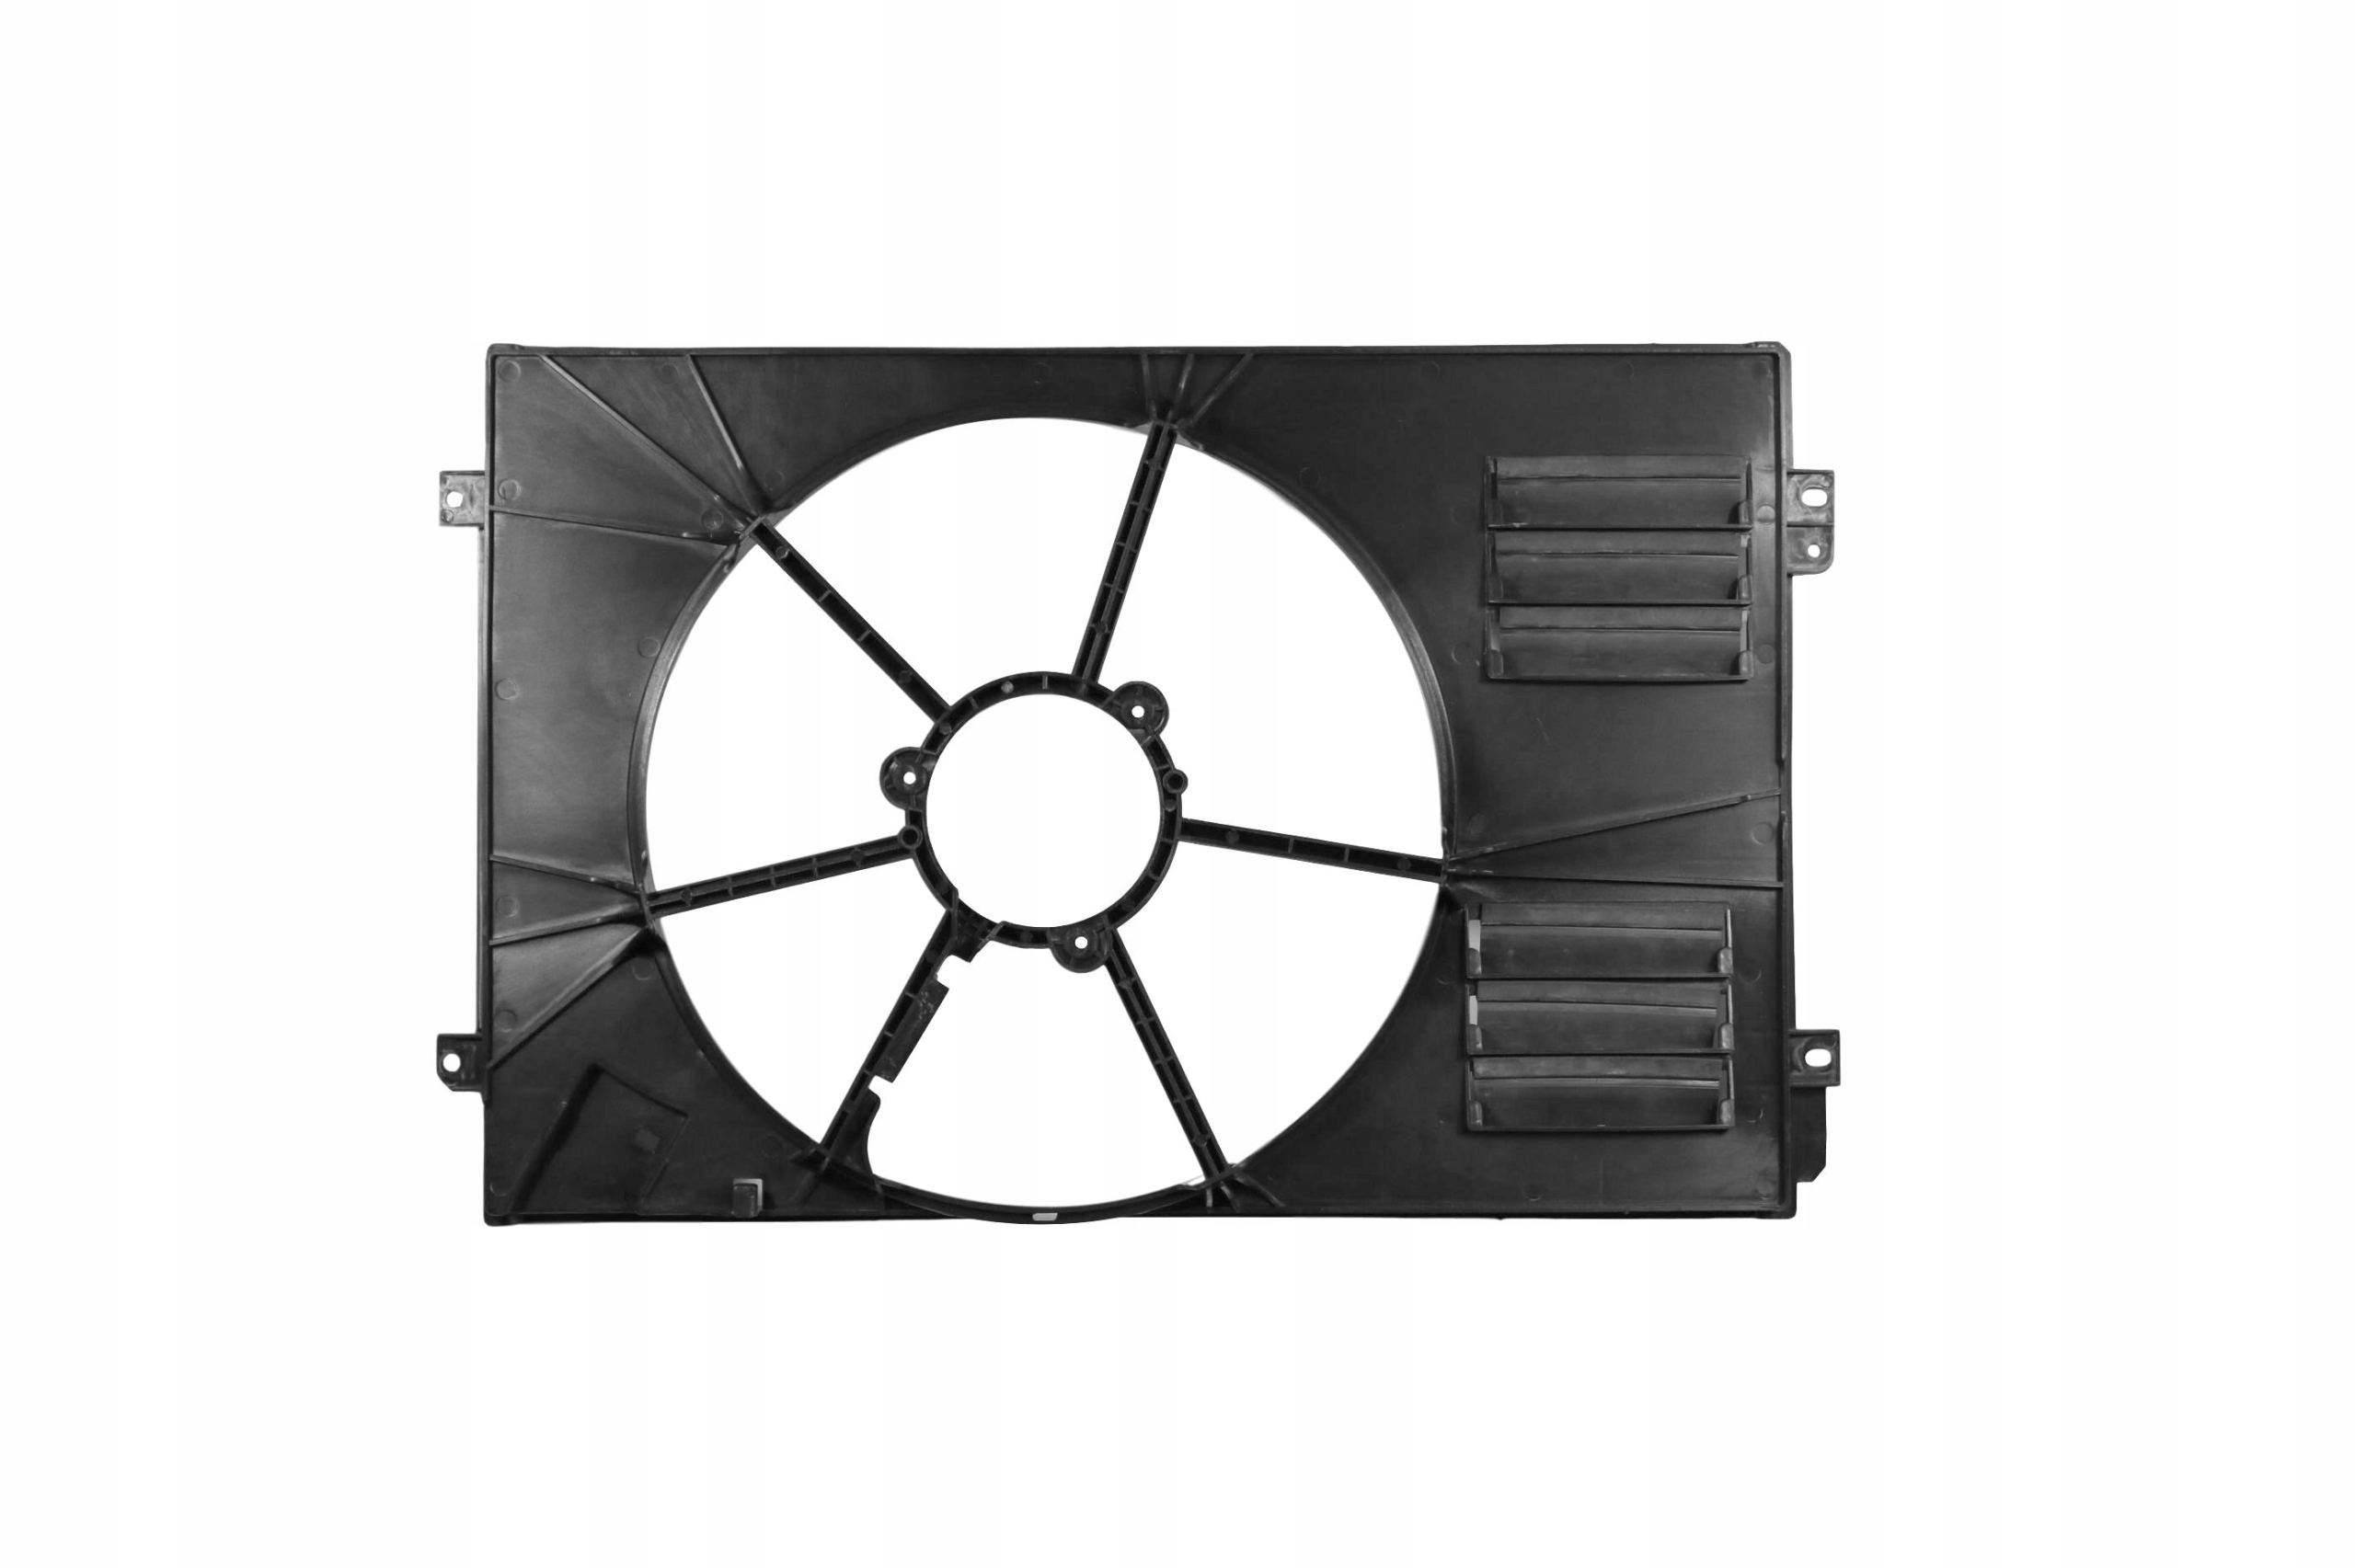 вентилятор корпус vw caddy iv 2 0tdi 1k0121205ac